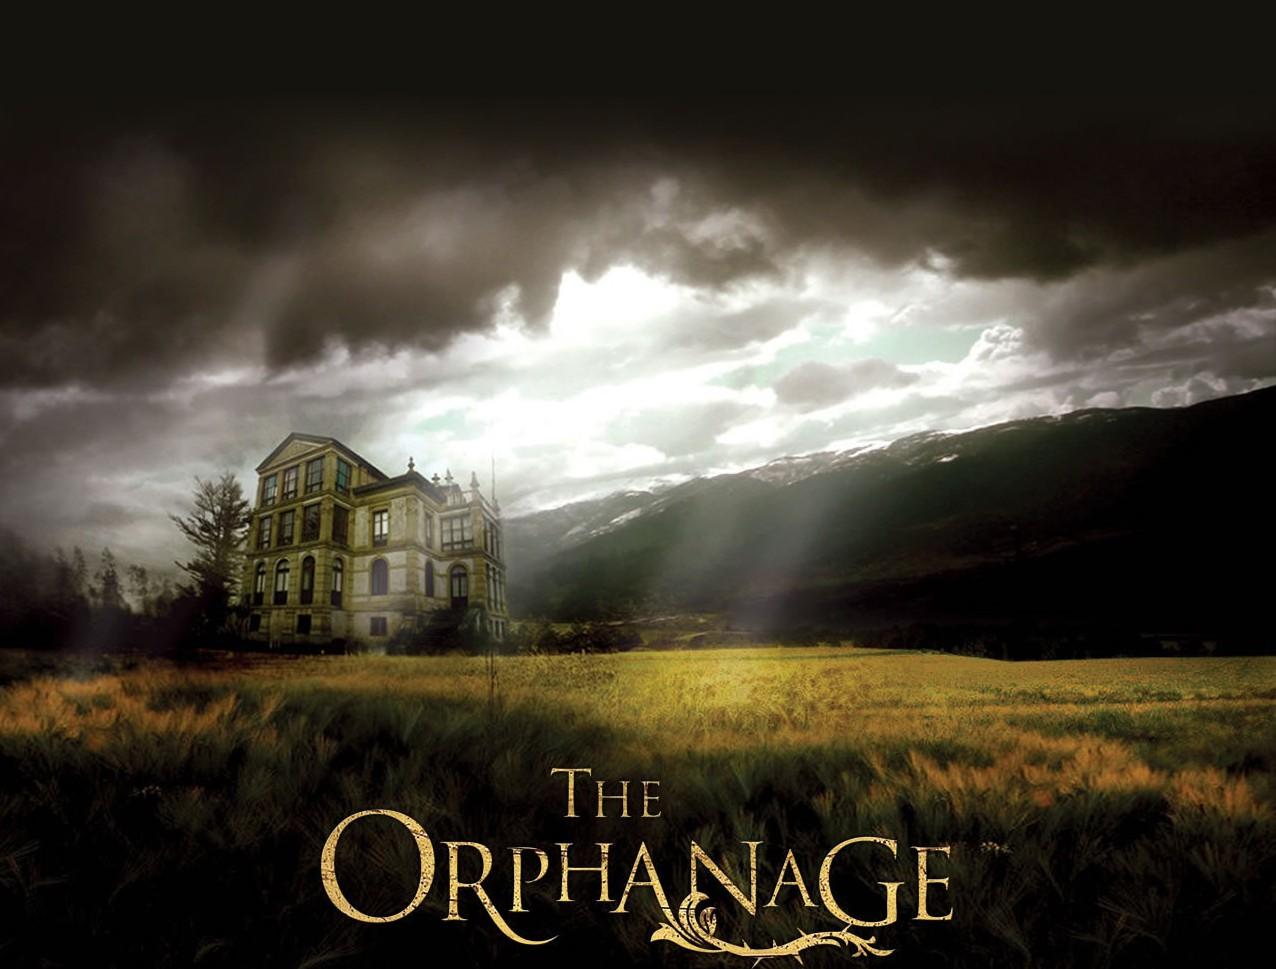 the orphanage review The orphanage (100 mins, 15) directed by juan antonio bayona starring belén  rueda, fernando cayo, roger príncep, geraldine chaplin,.